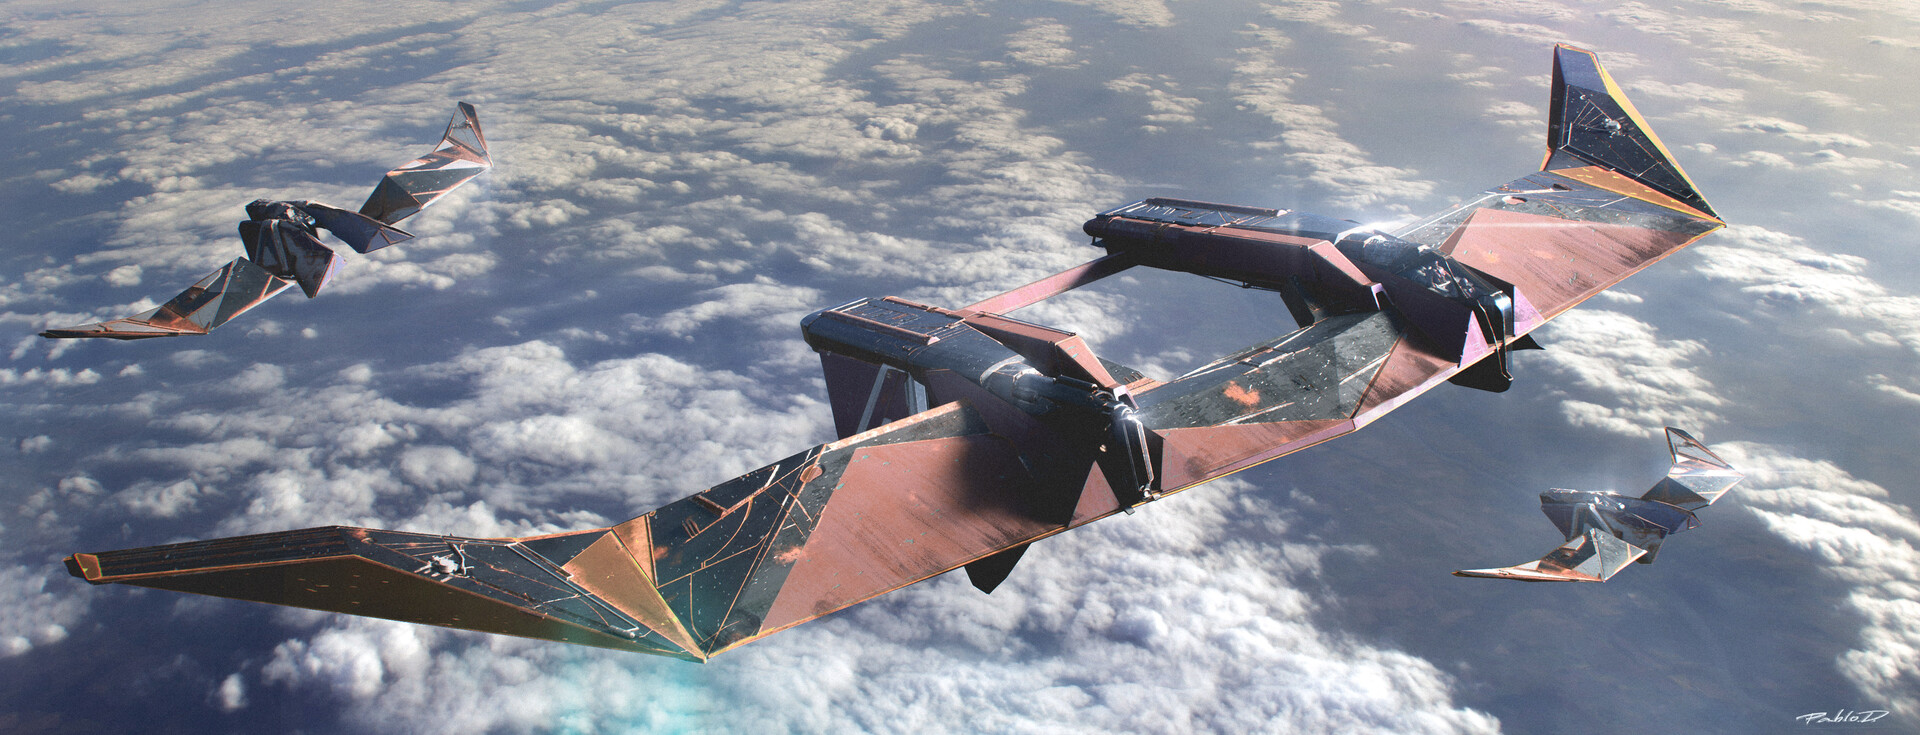 pablo-dominguez-bomber5.jpg?1565457609